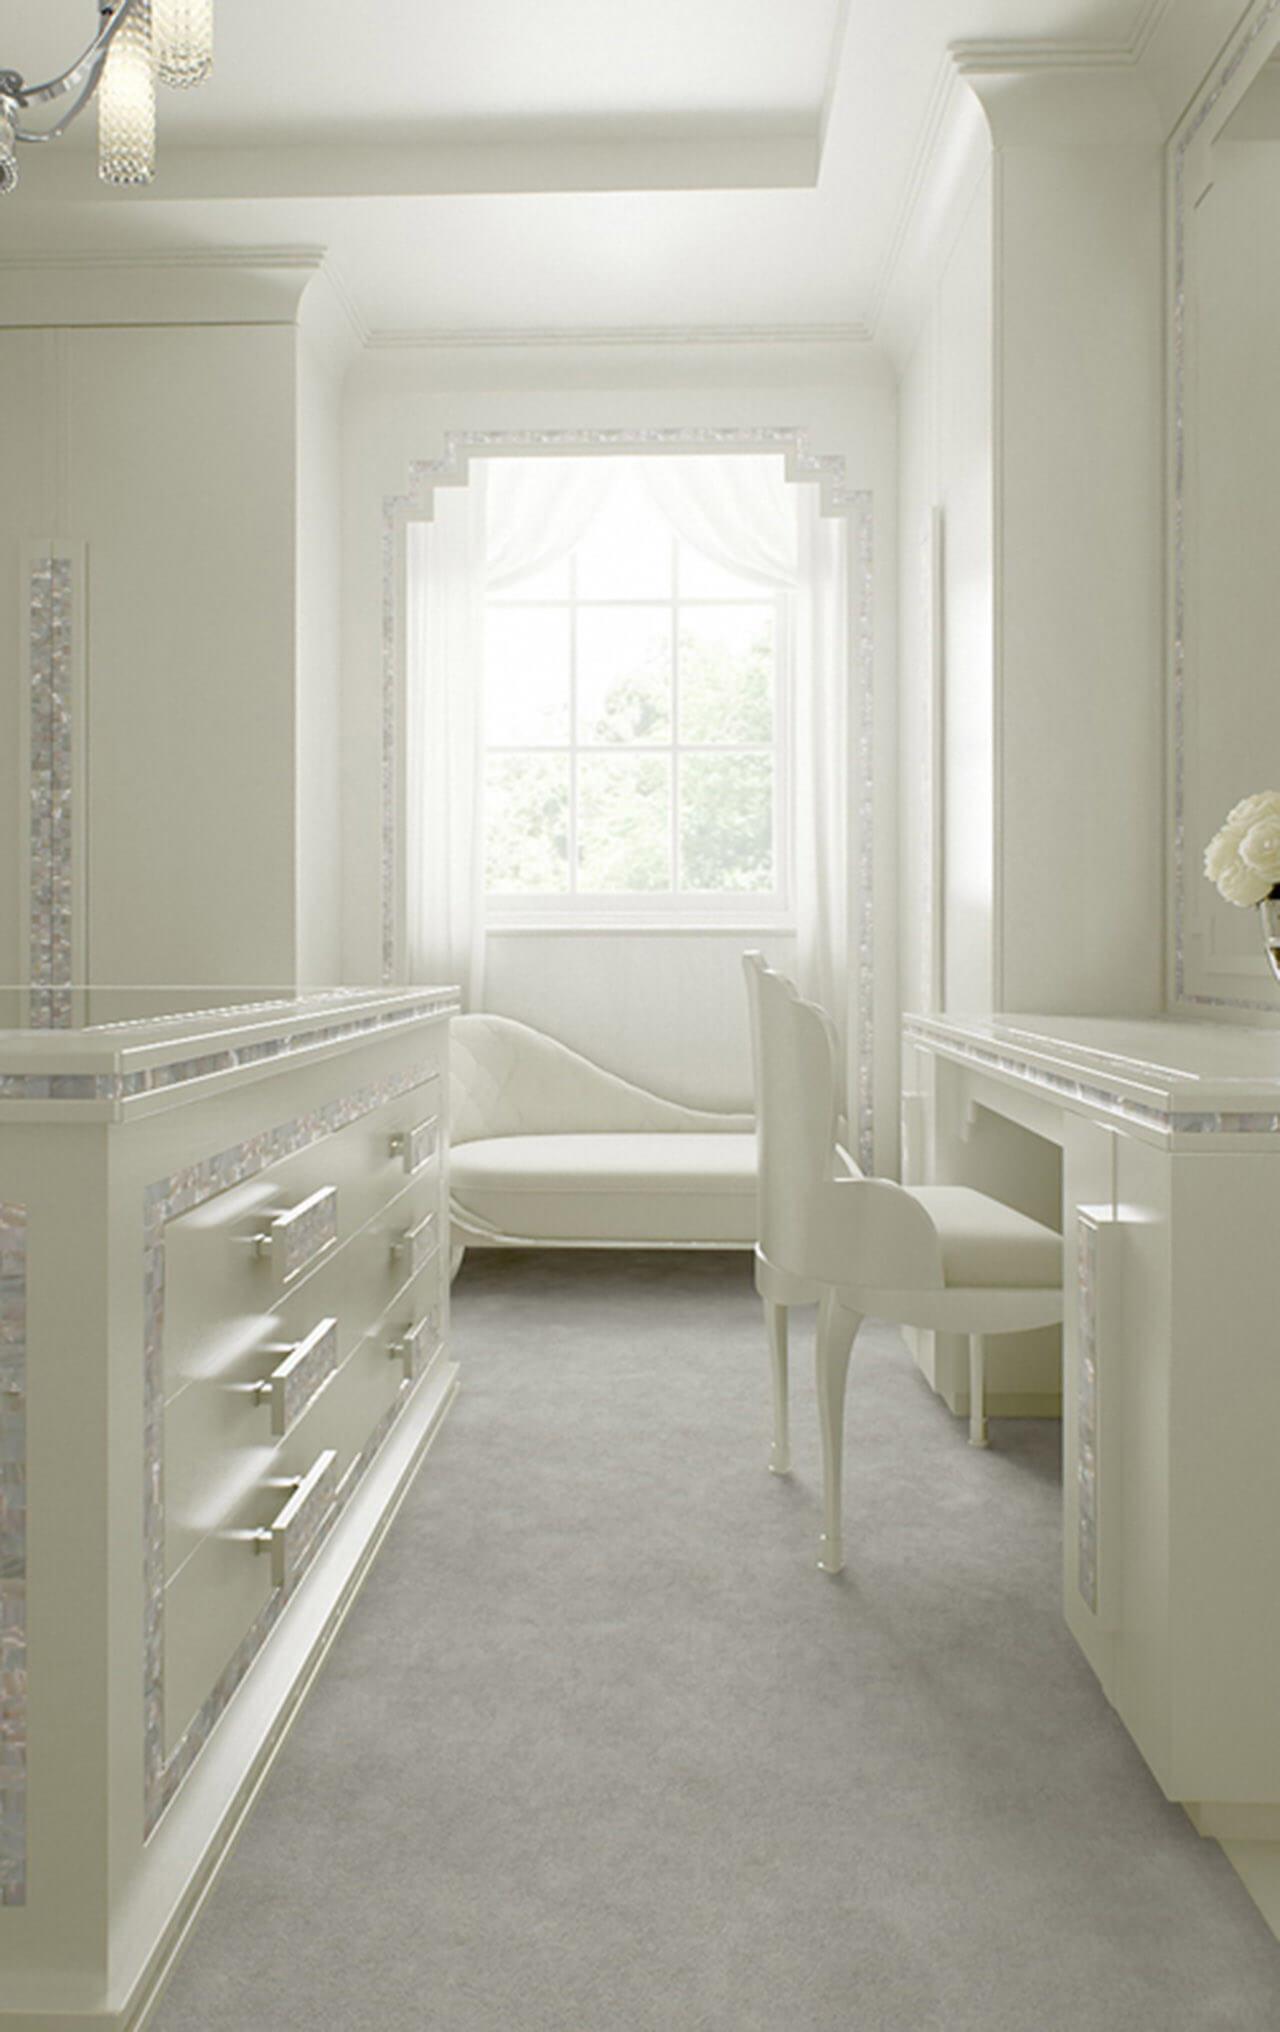 interior renders, architecture , architectural visualisation, arch viz, rendered interiors, CGI rendered interiors